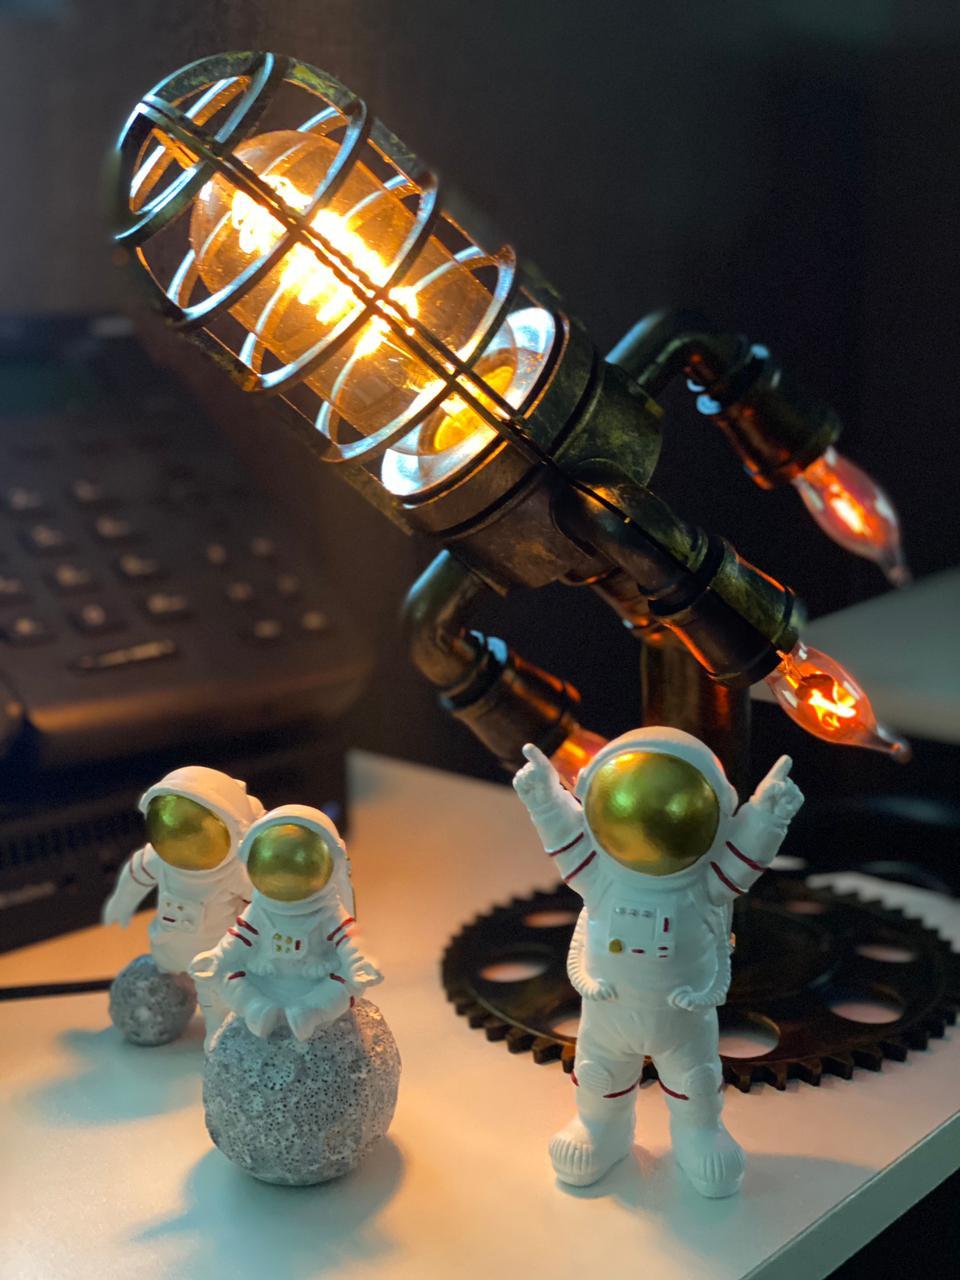 Luminária Nasa Foguete Nave Espacial Rocket Lamp Steampunk Astronauta de Mesa Decorativa